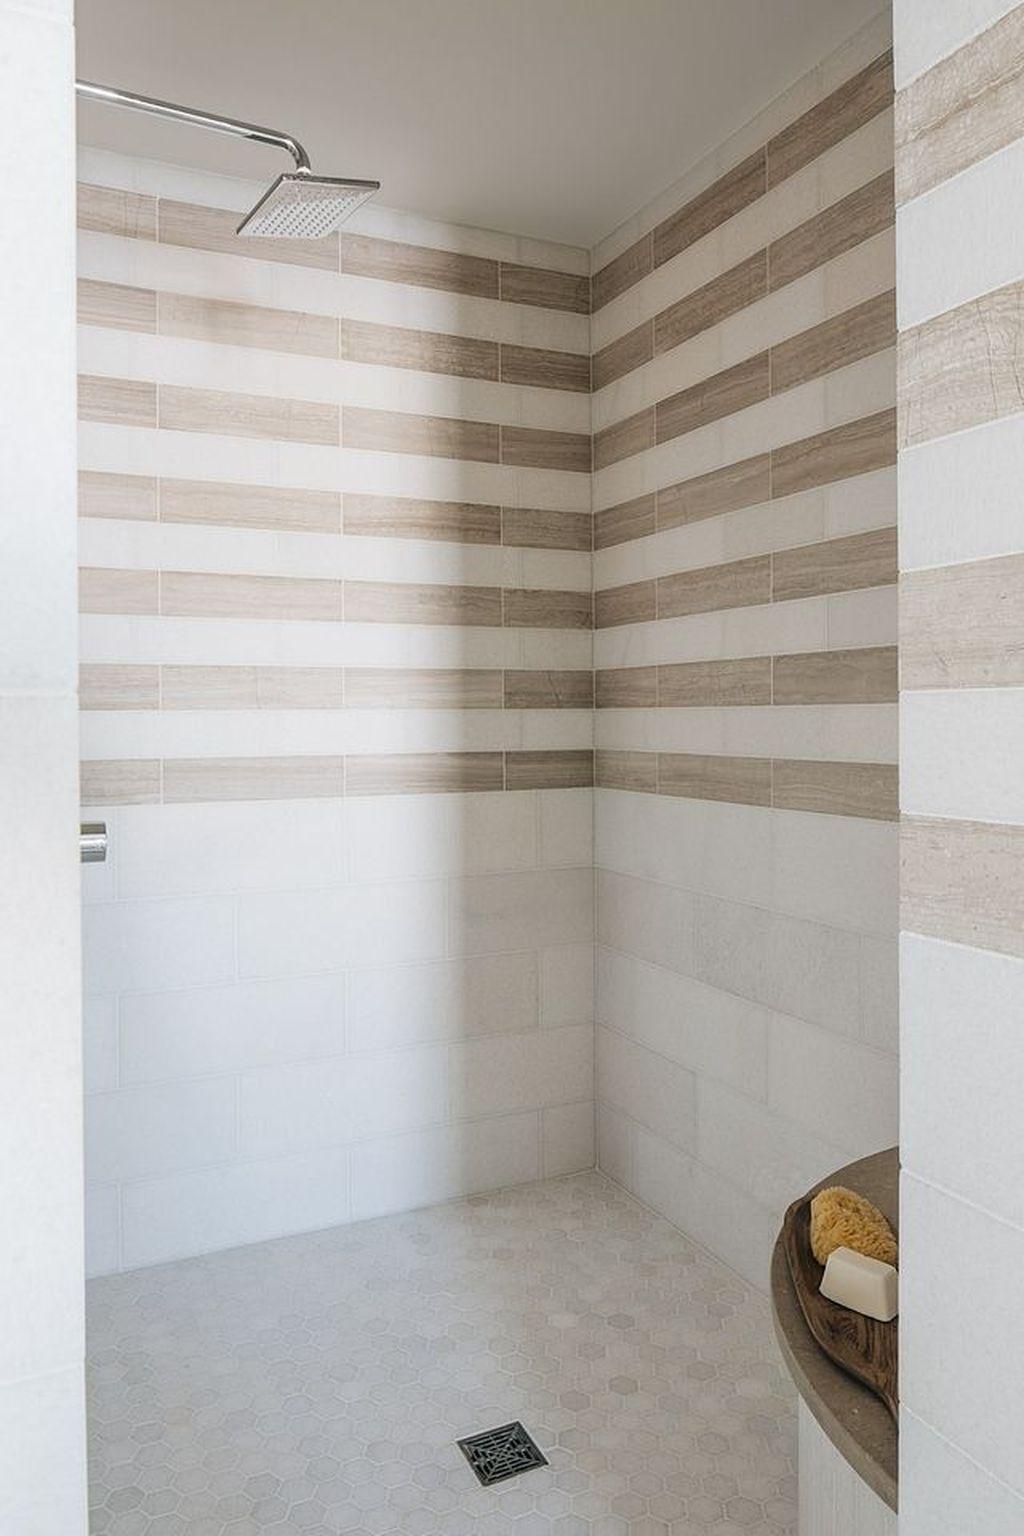 Astonishing Farmhouse Shower Tile Decor Ideas To Try 37